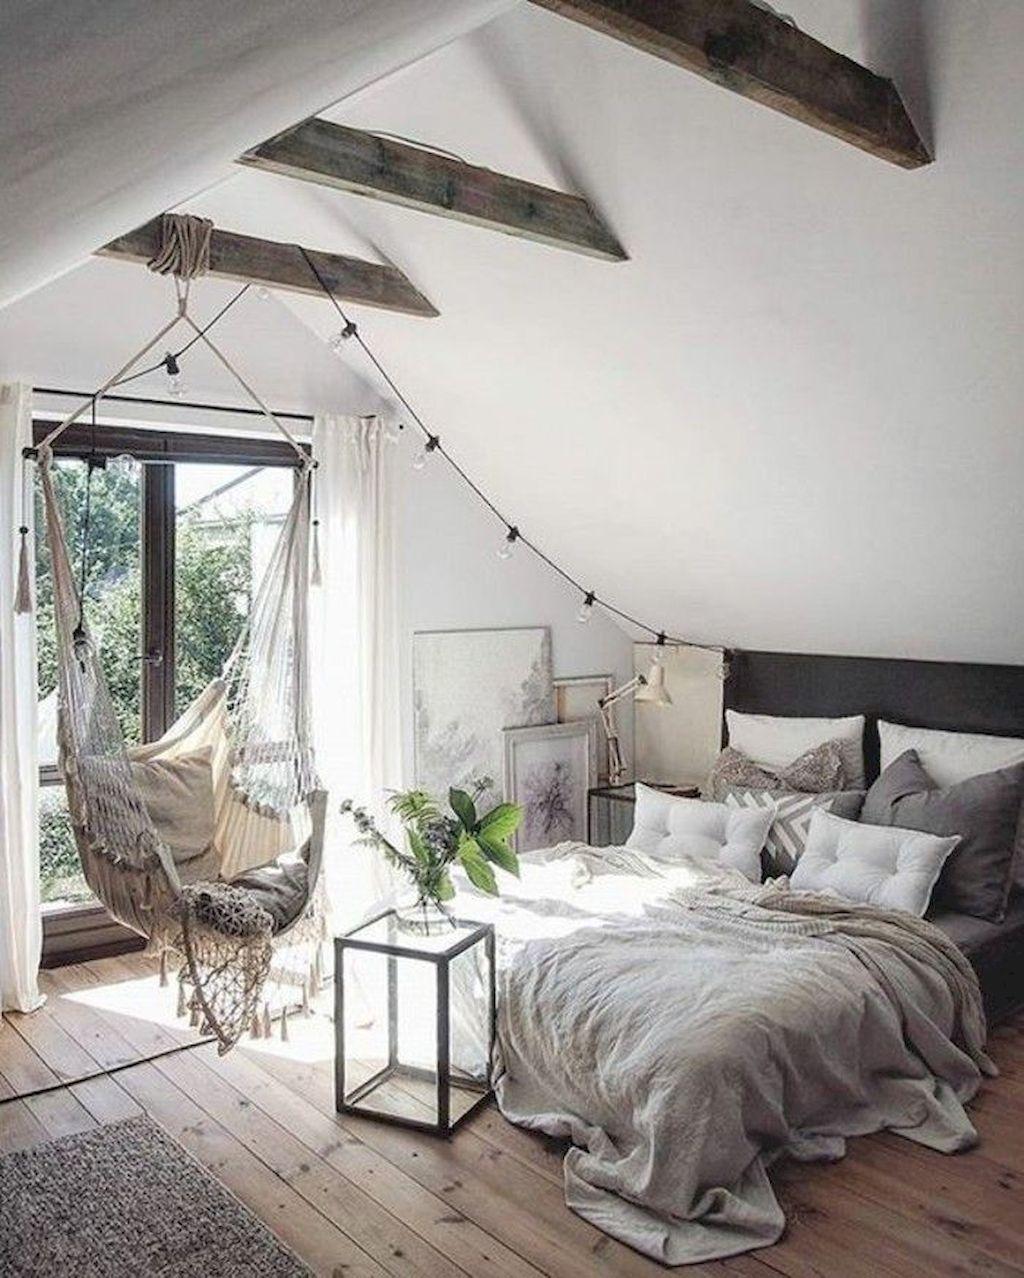 Awesome cozy bedroom decor ideas buildecorcozy